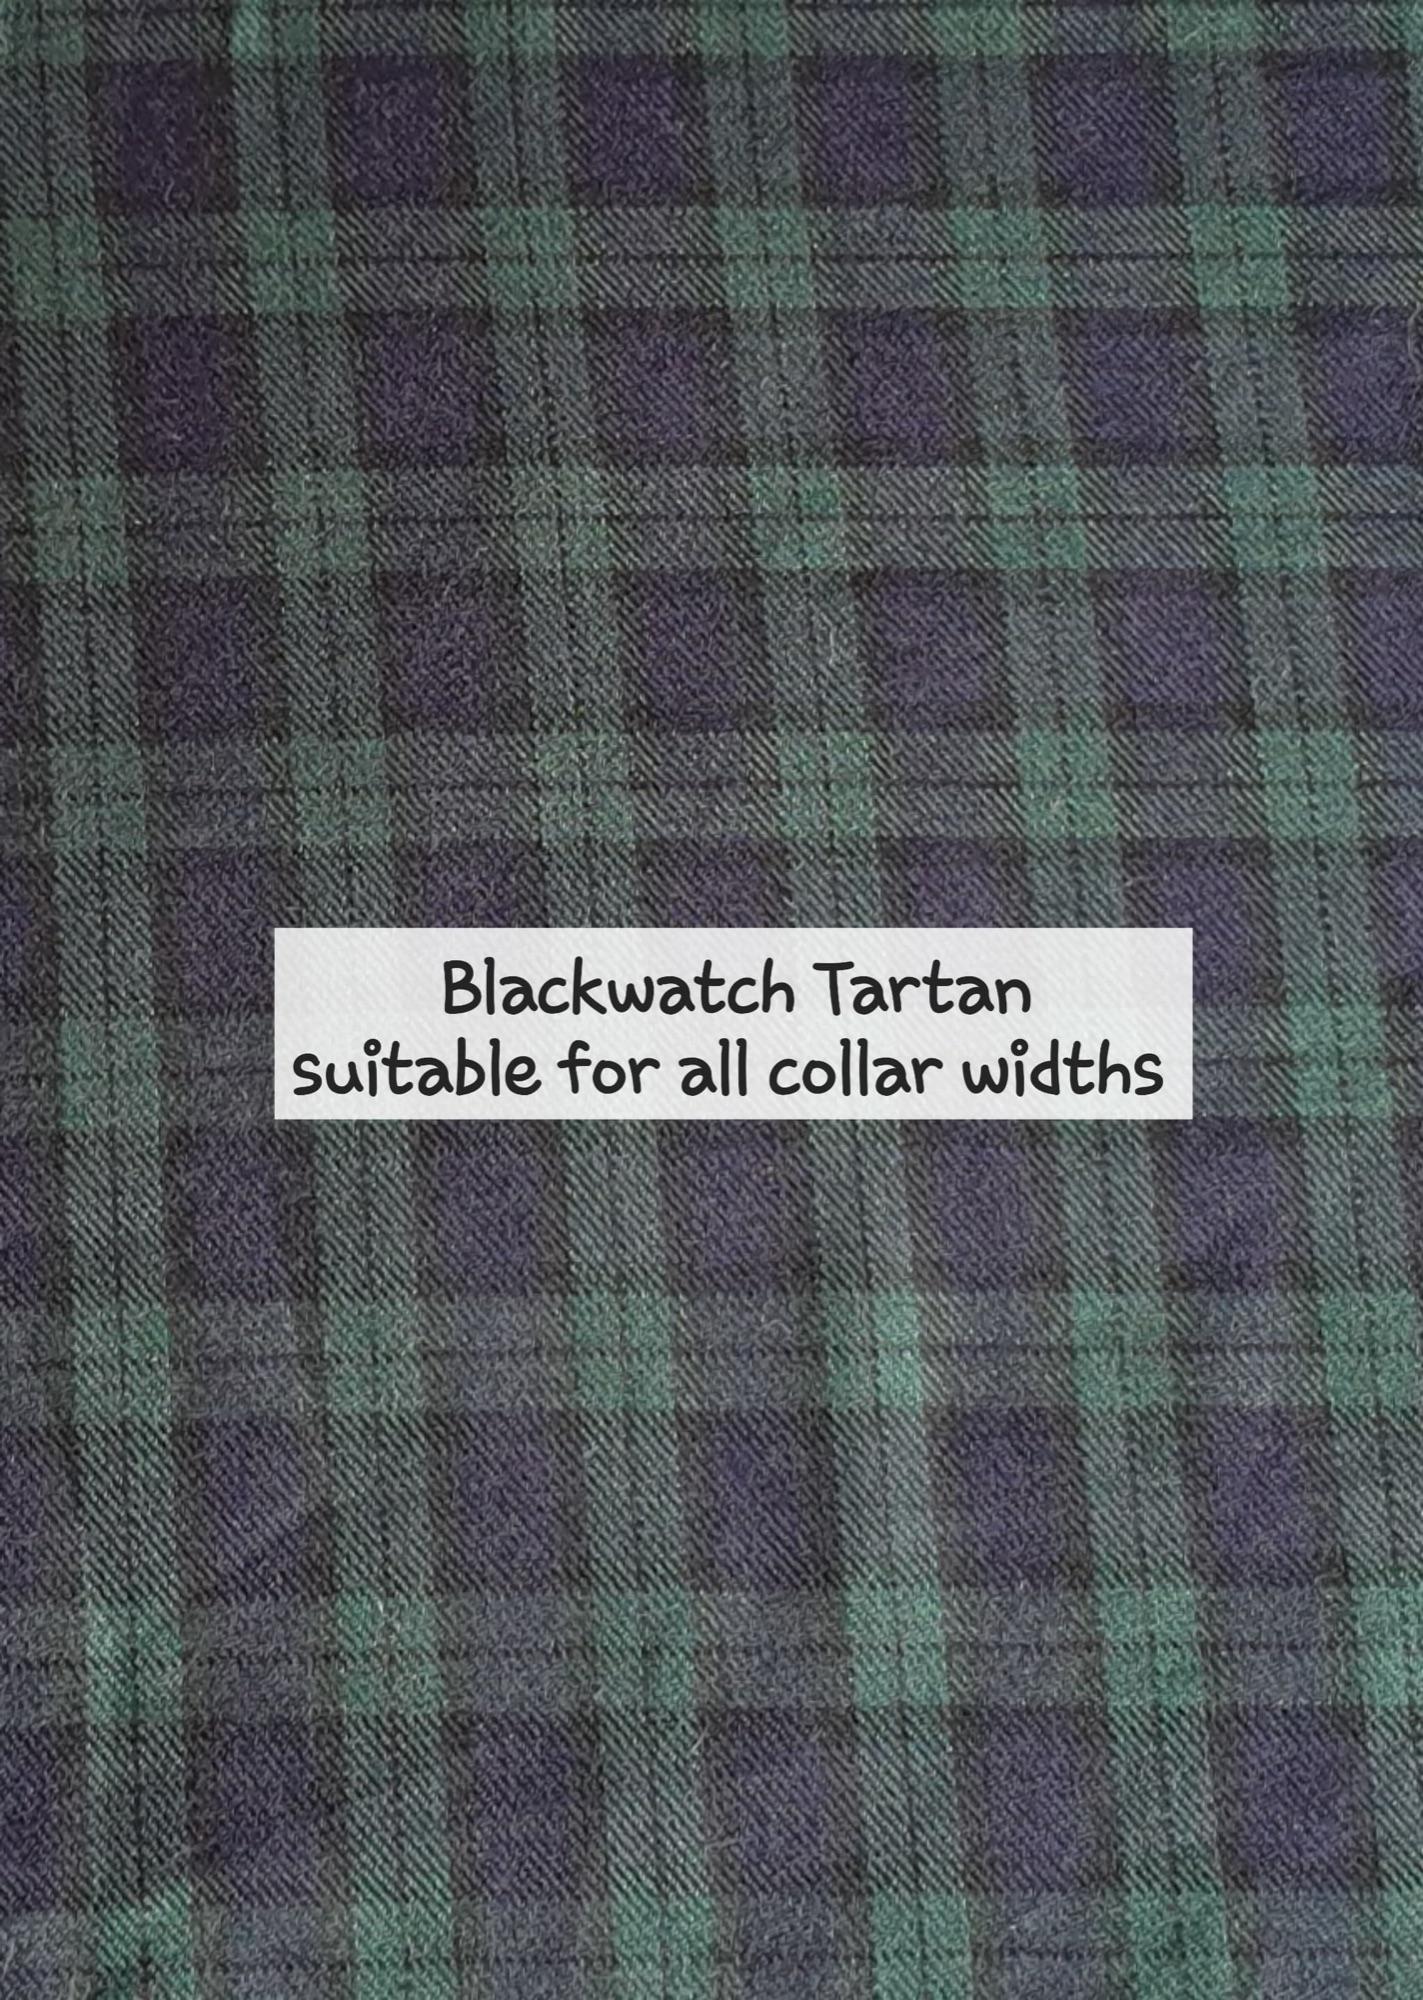 Blackwatch Tartan